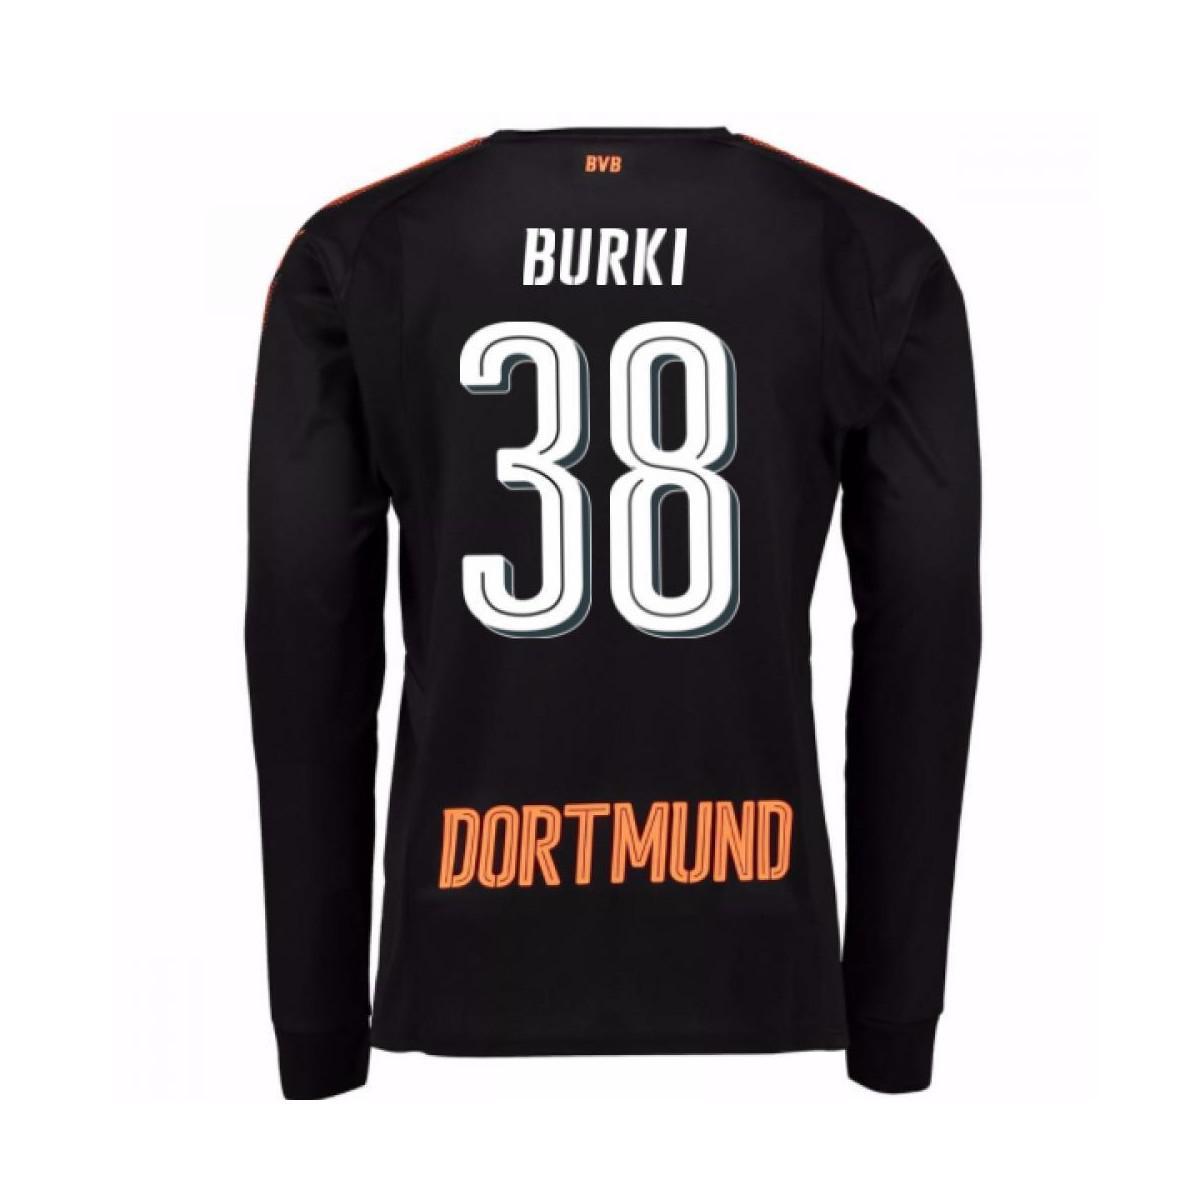 8d667f06c8b PUMA 2017-18 Borussia Dortmund Home Goalkeeper Shirt (burki 38 ...